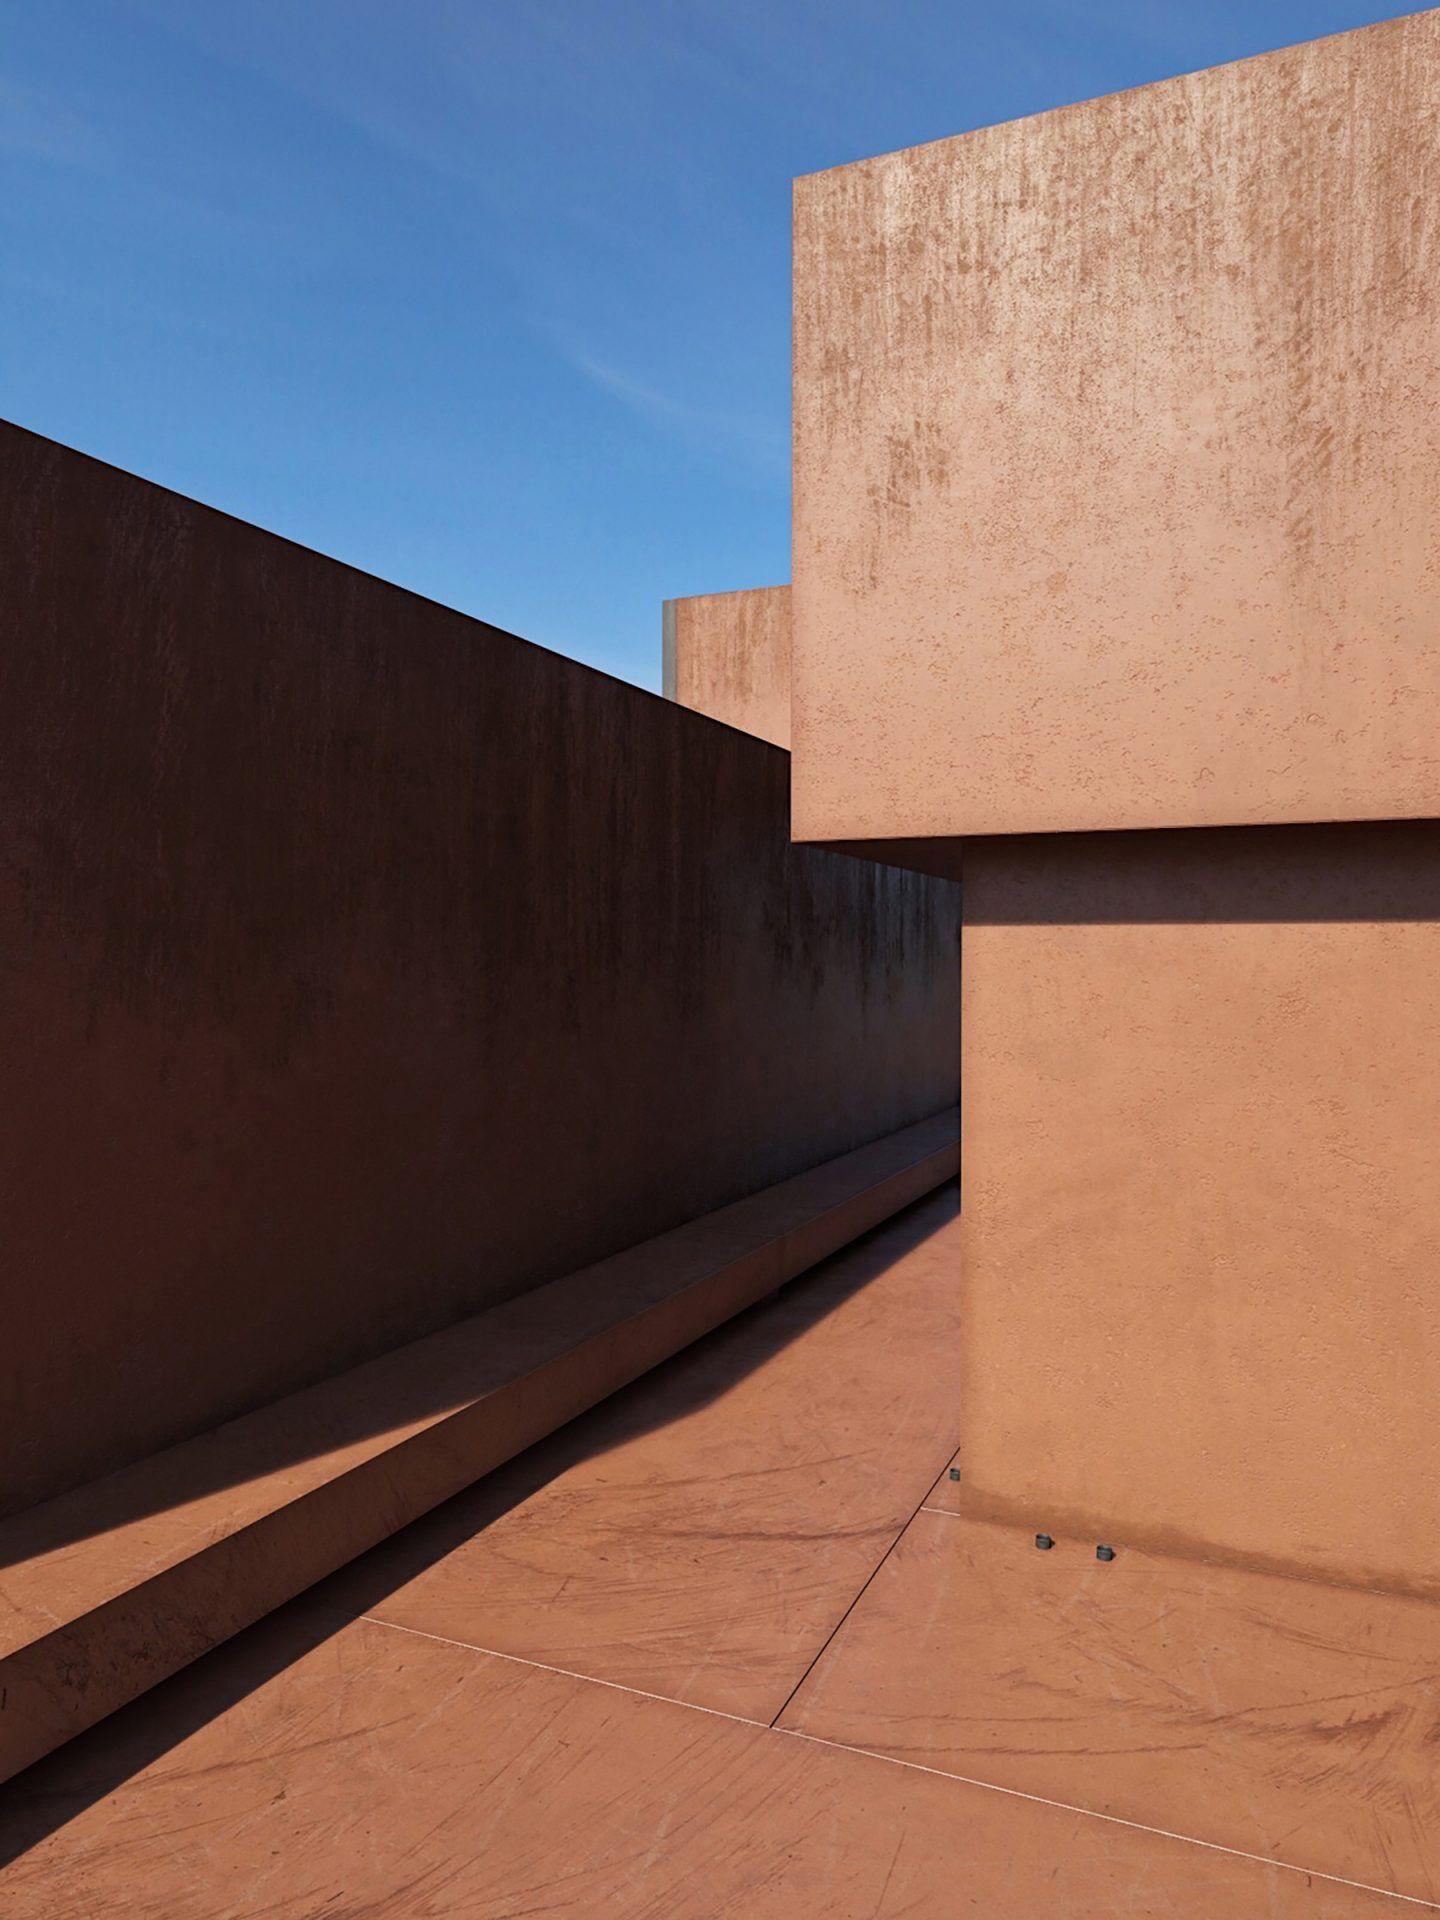 IGNANT-Architecture-SPRW-Architects-Flatness-01